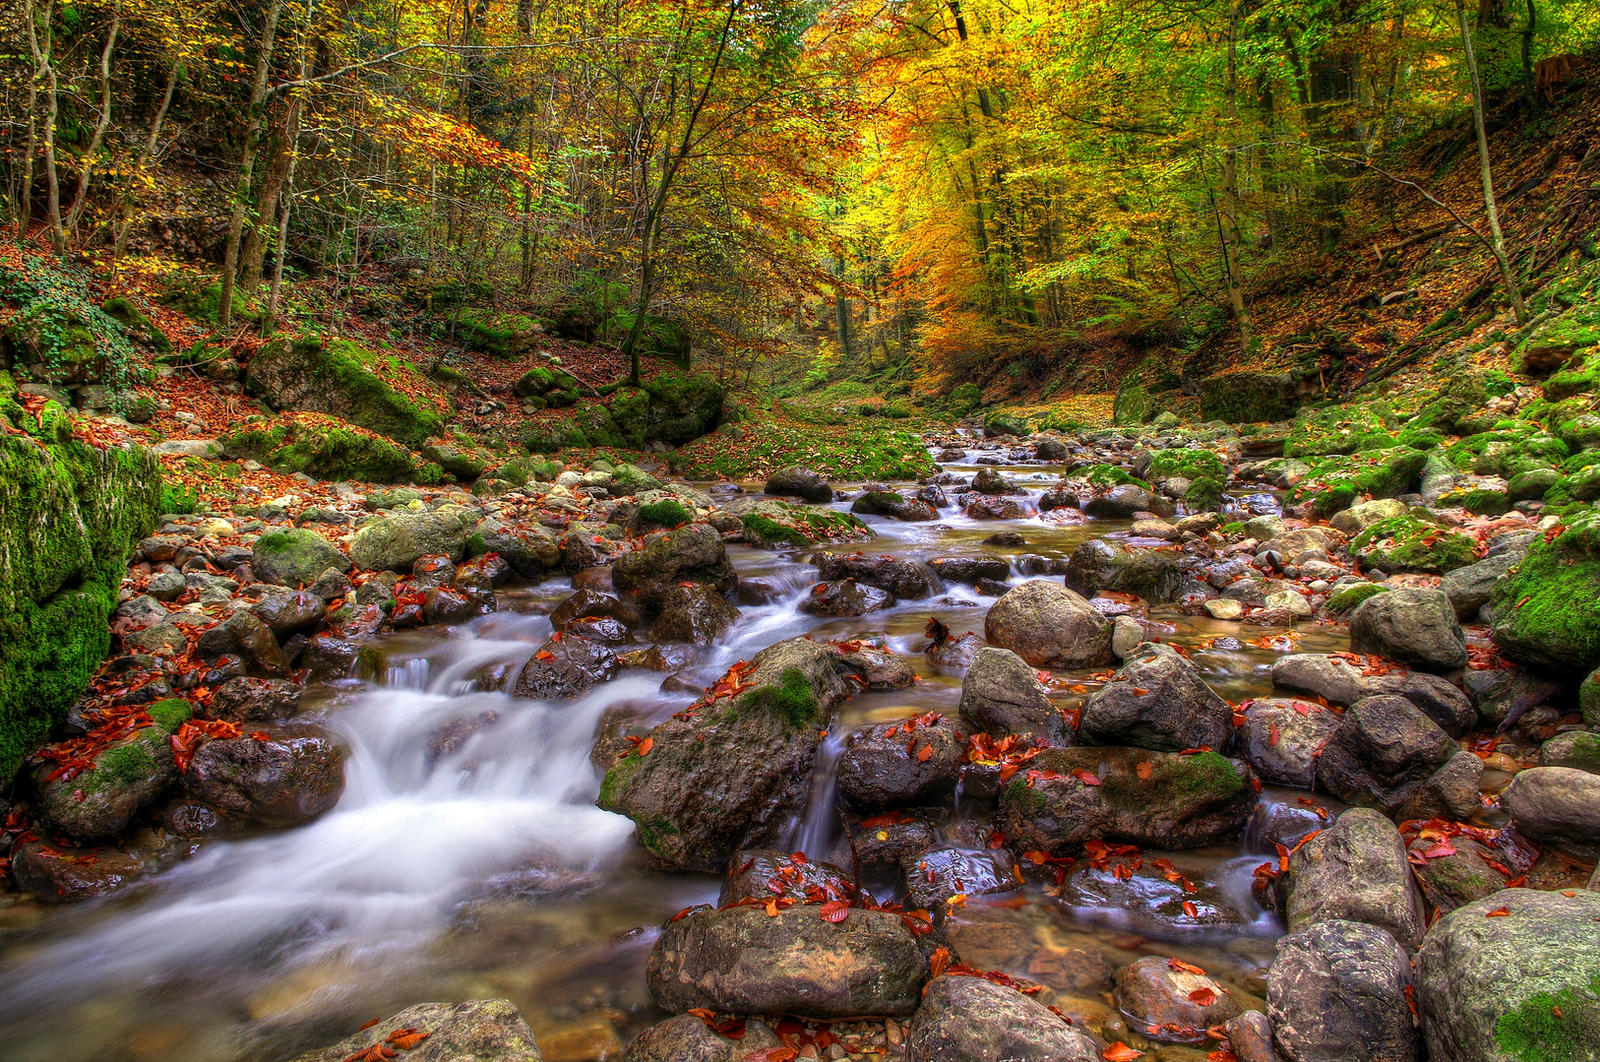 Autumn Forest 2nd by Burtn